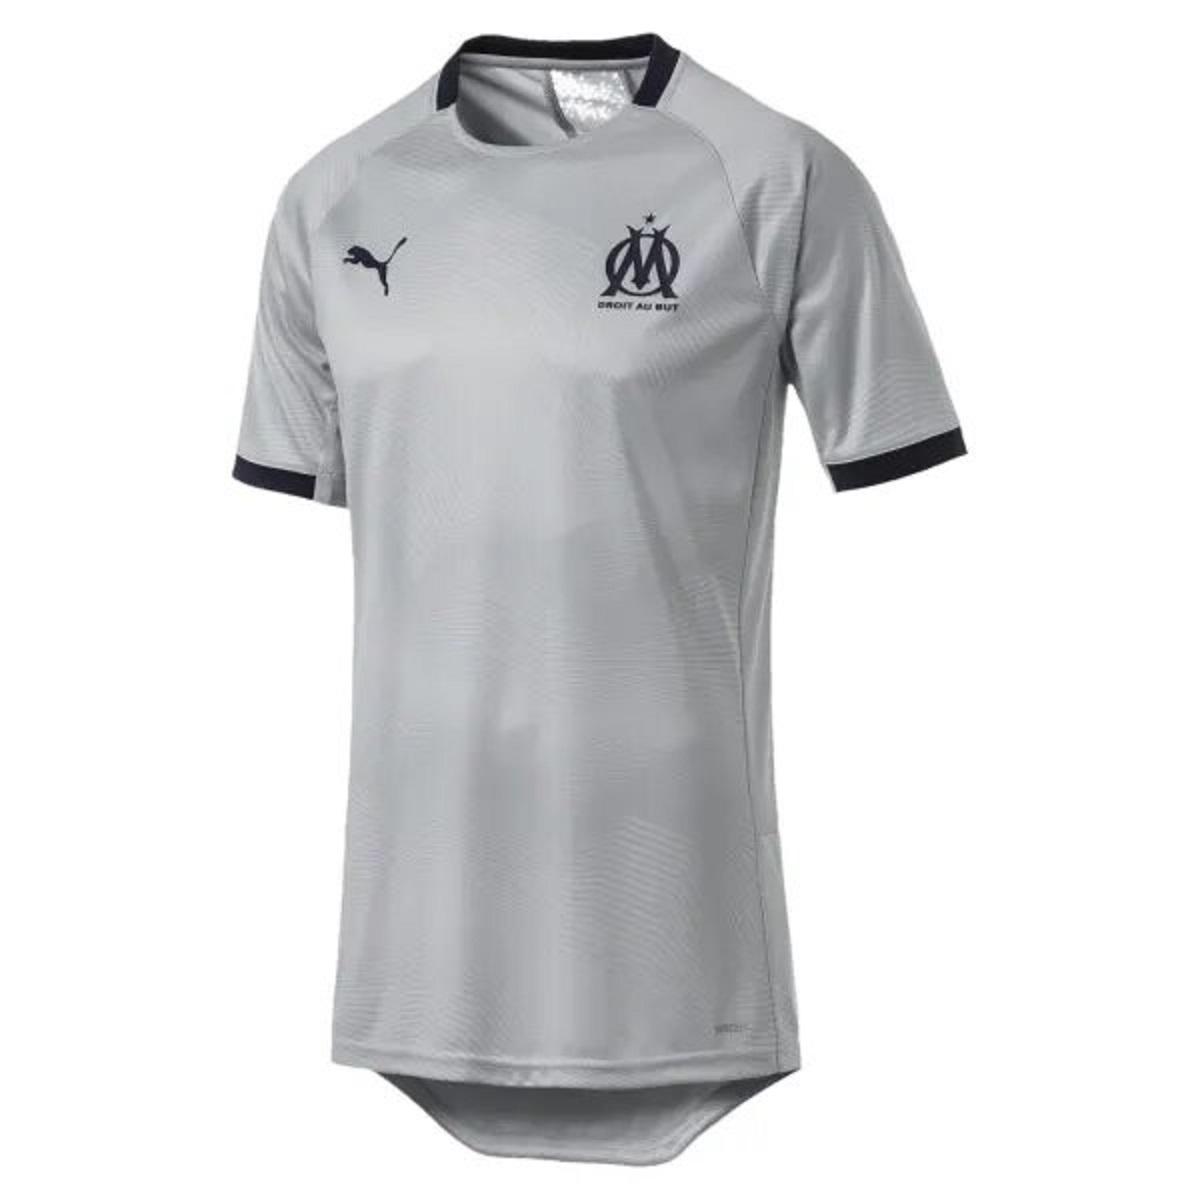 PUMA Olympique DE Marseille Graphic Jersey Maglia da Calcio